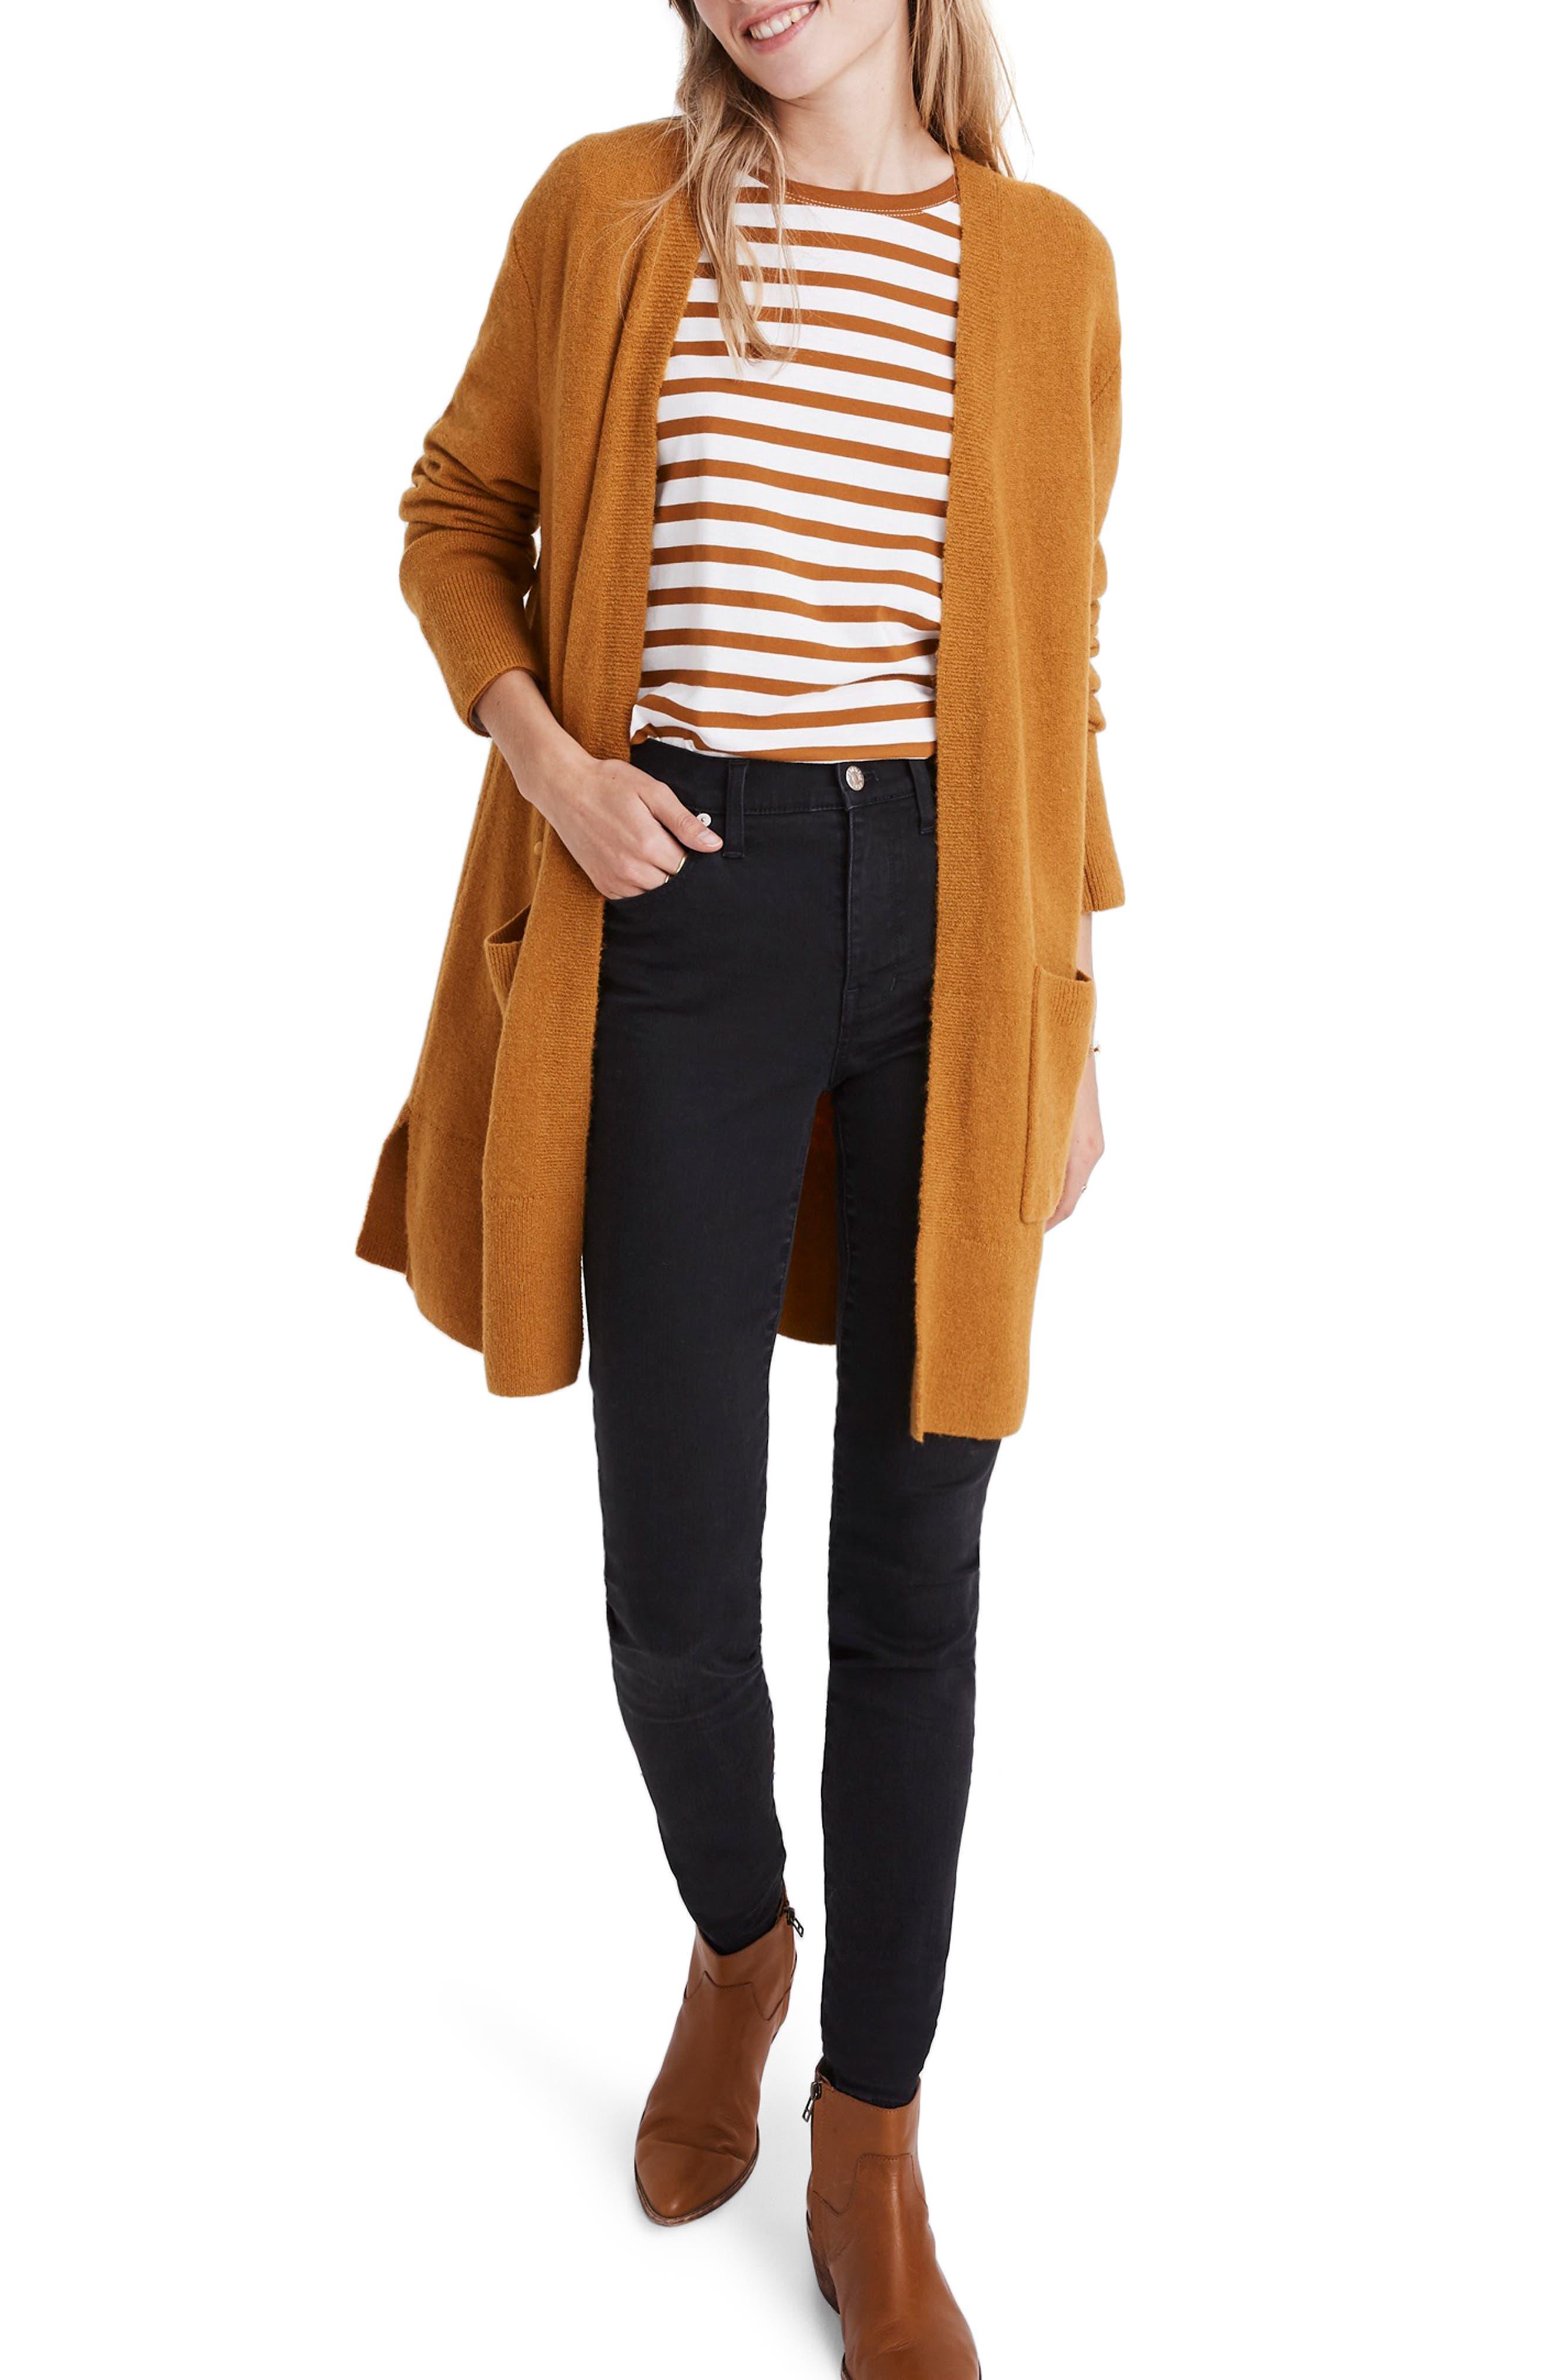 MADEWELL, Kent Cardigan Sweater, Main thumbnail 1, color, 801